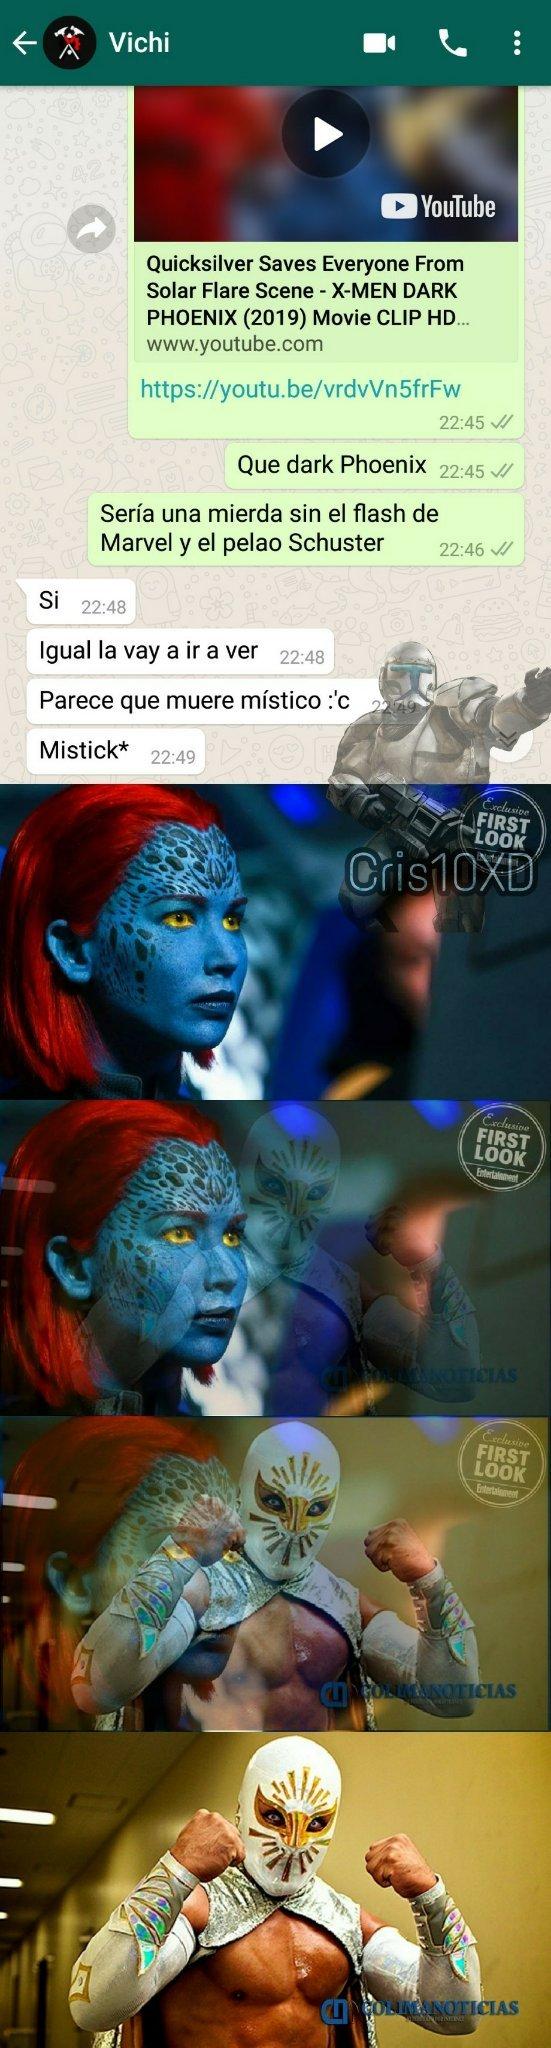 mystique diosa :) - meme